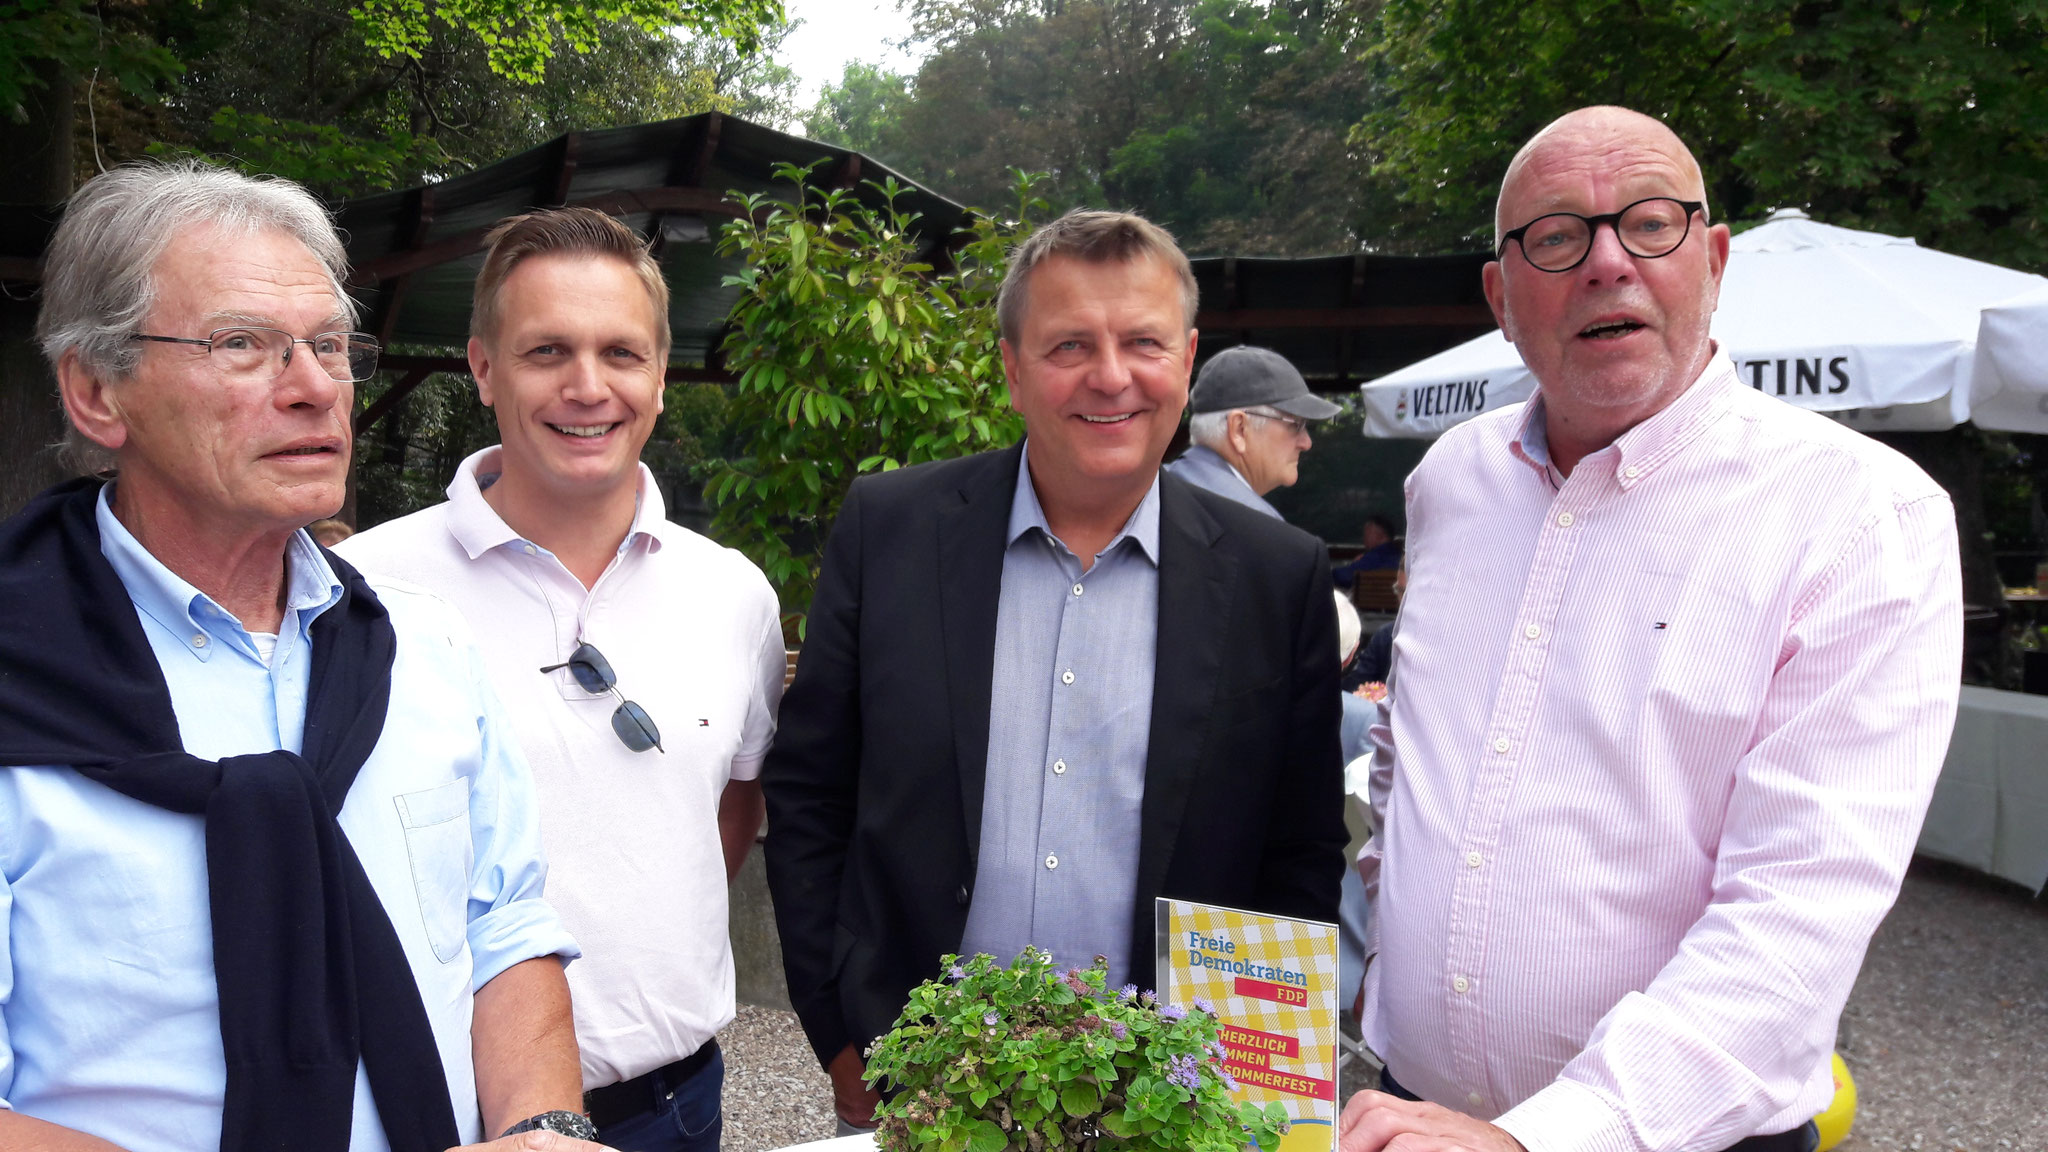 von links nach rechts: Dr. Gunter Bals, Arno Zurbrüggen, Christof Rasche (MdL), Hans Gerd-Völker